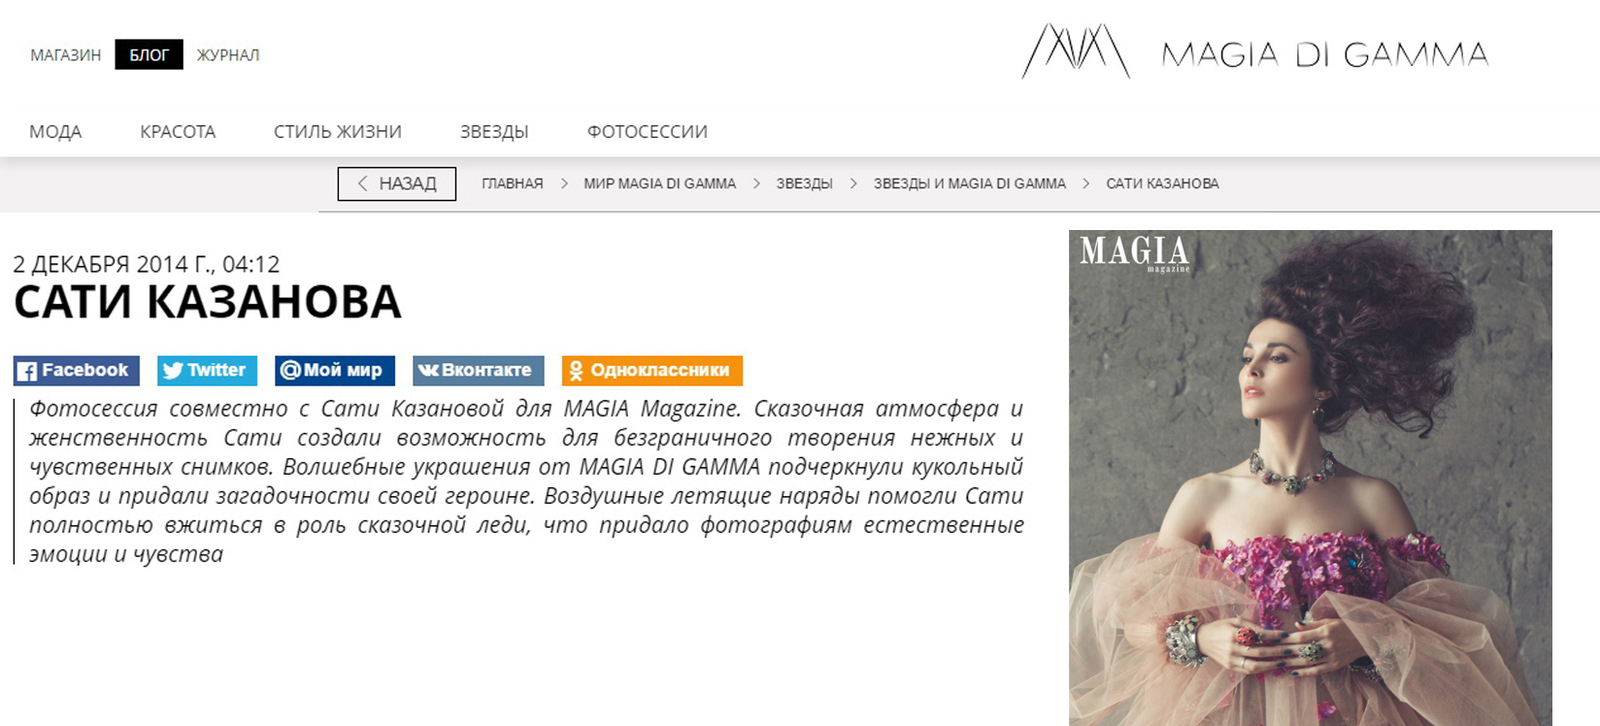 02.12.2014. Сати Казанова. Фотосессия для MAGIA Magazine